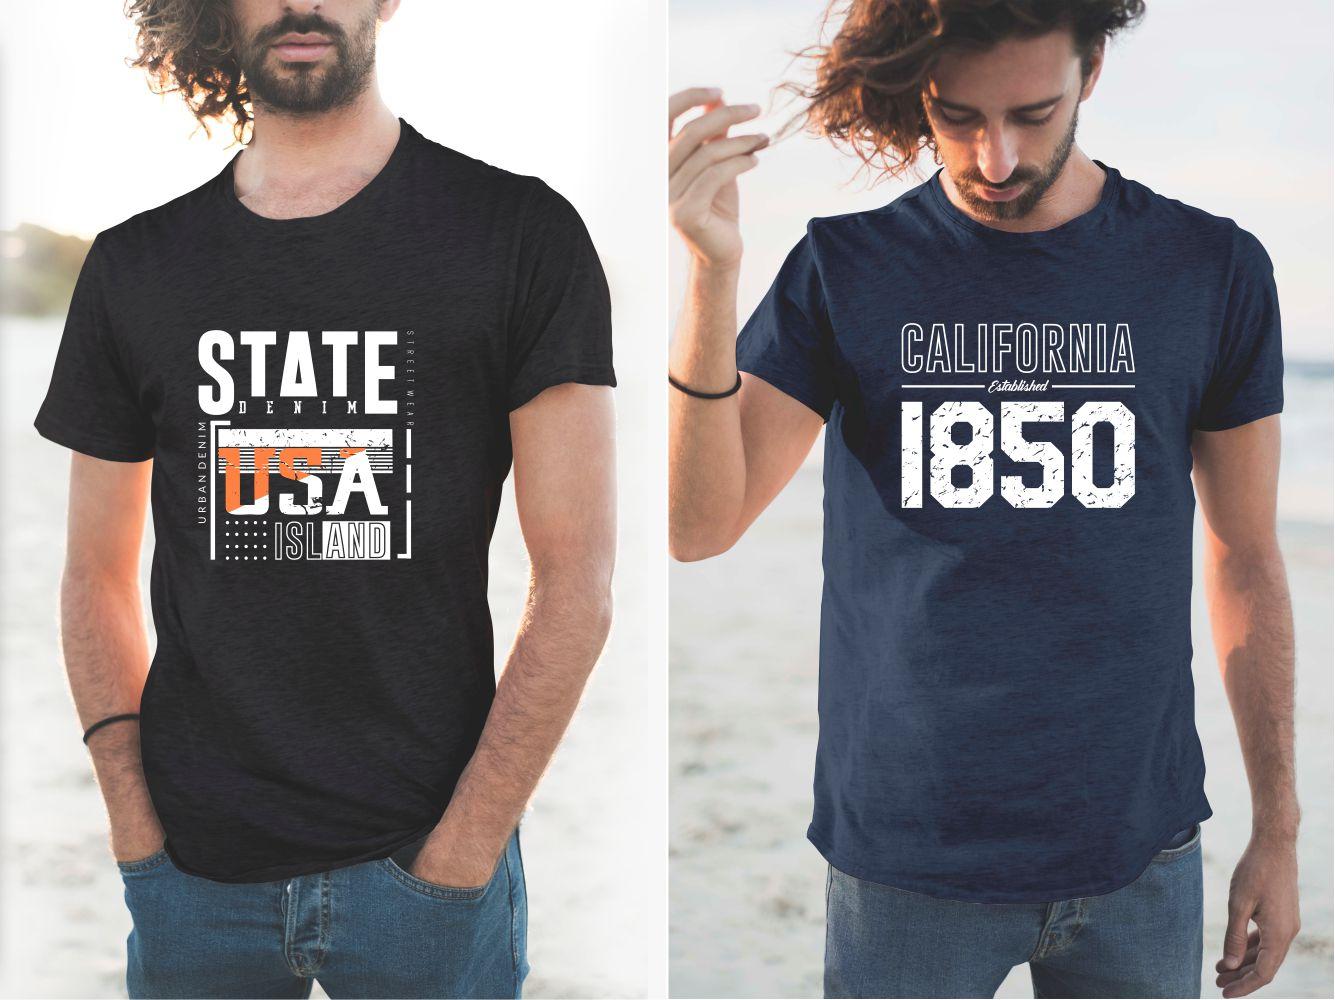 106 Urban T-shirt Designs Collection - 15 5